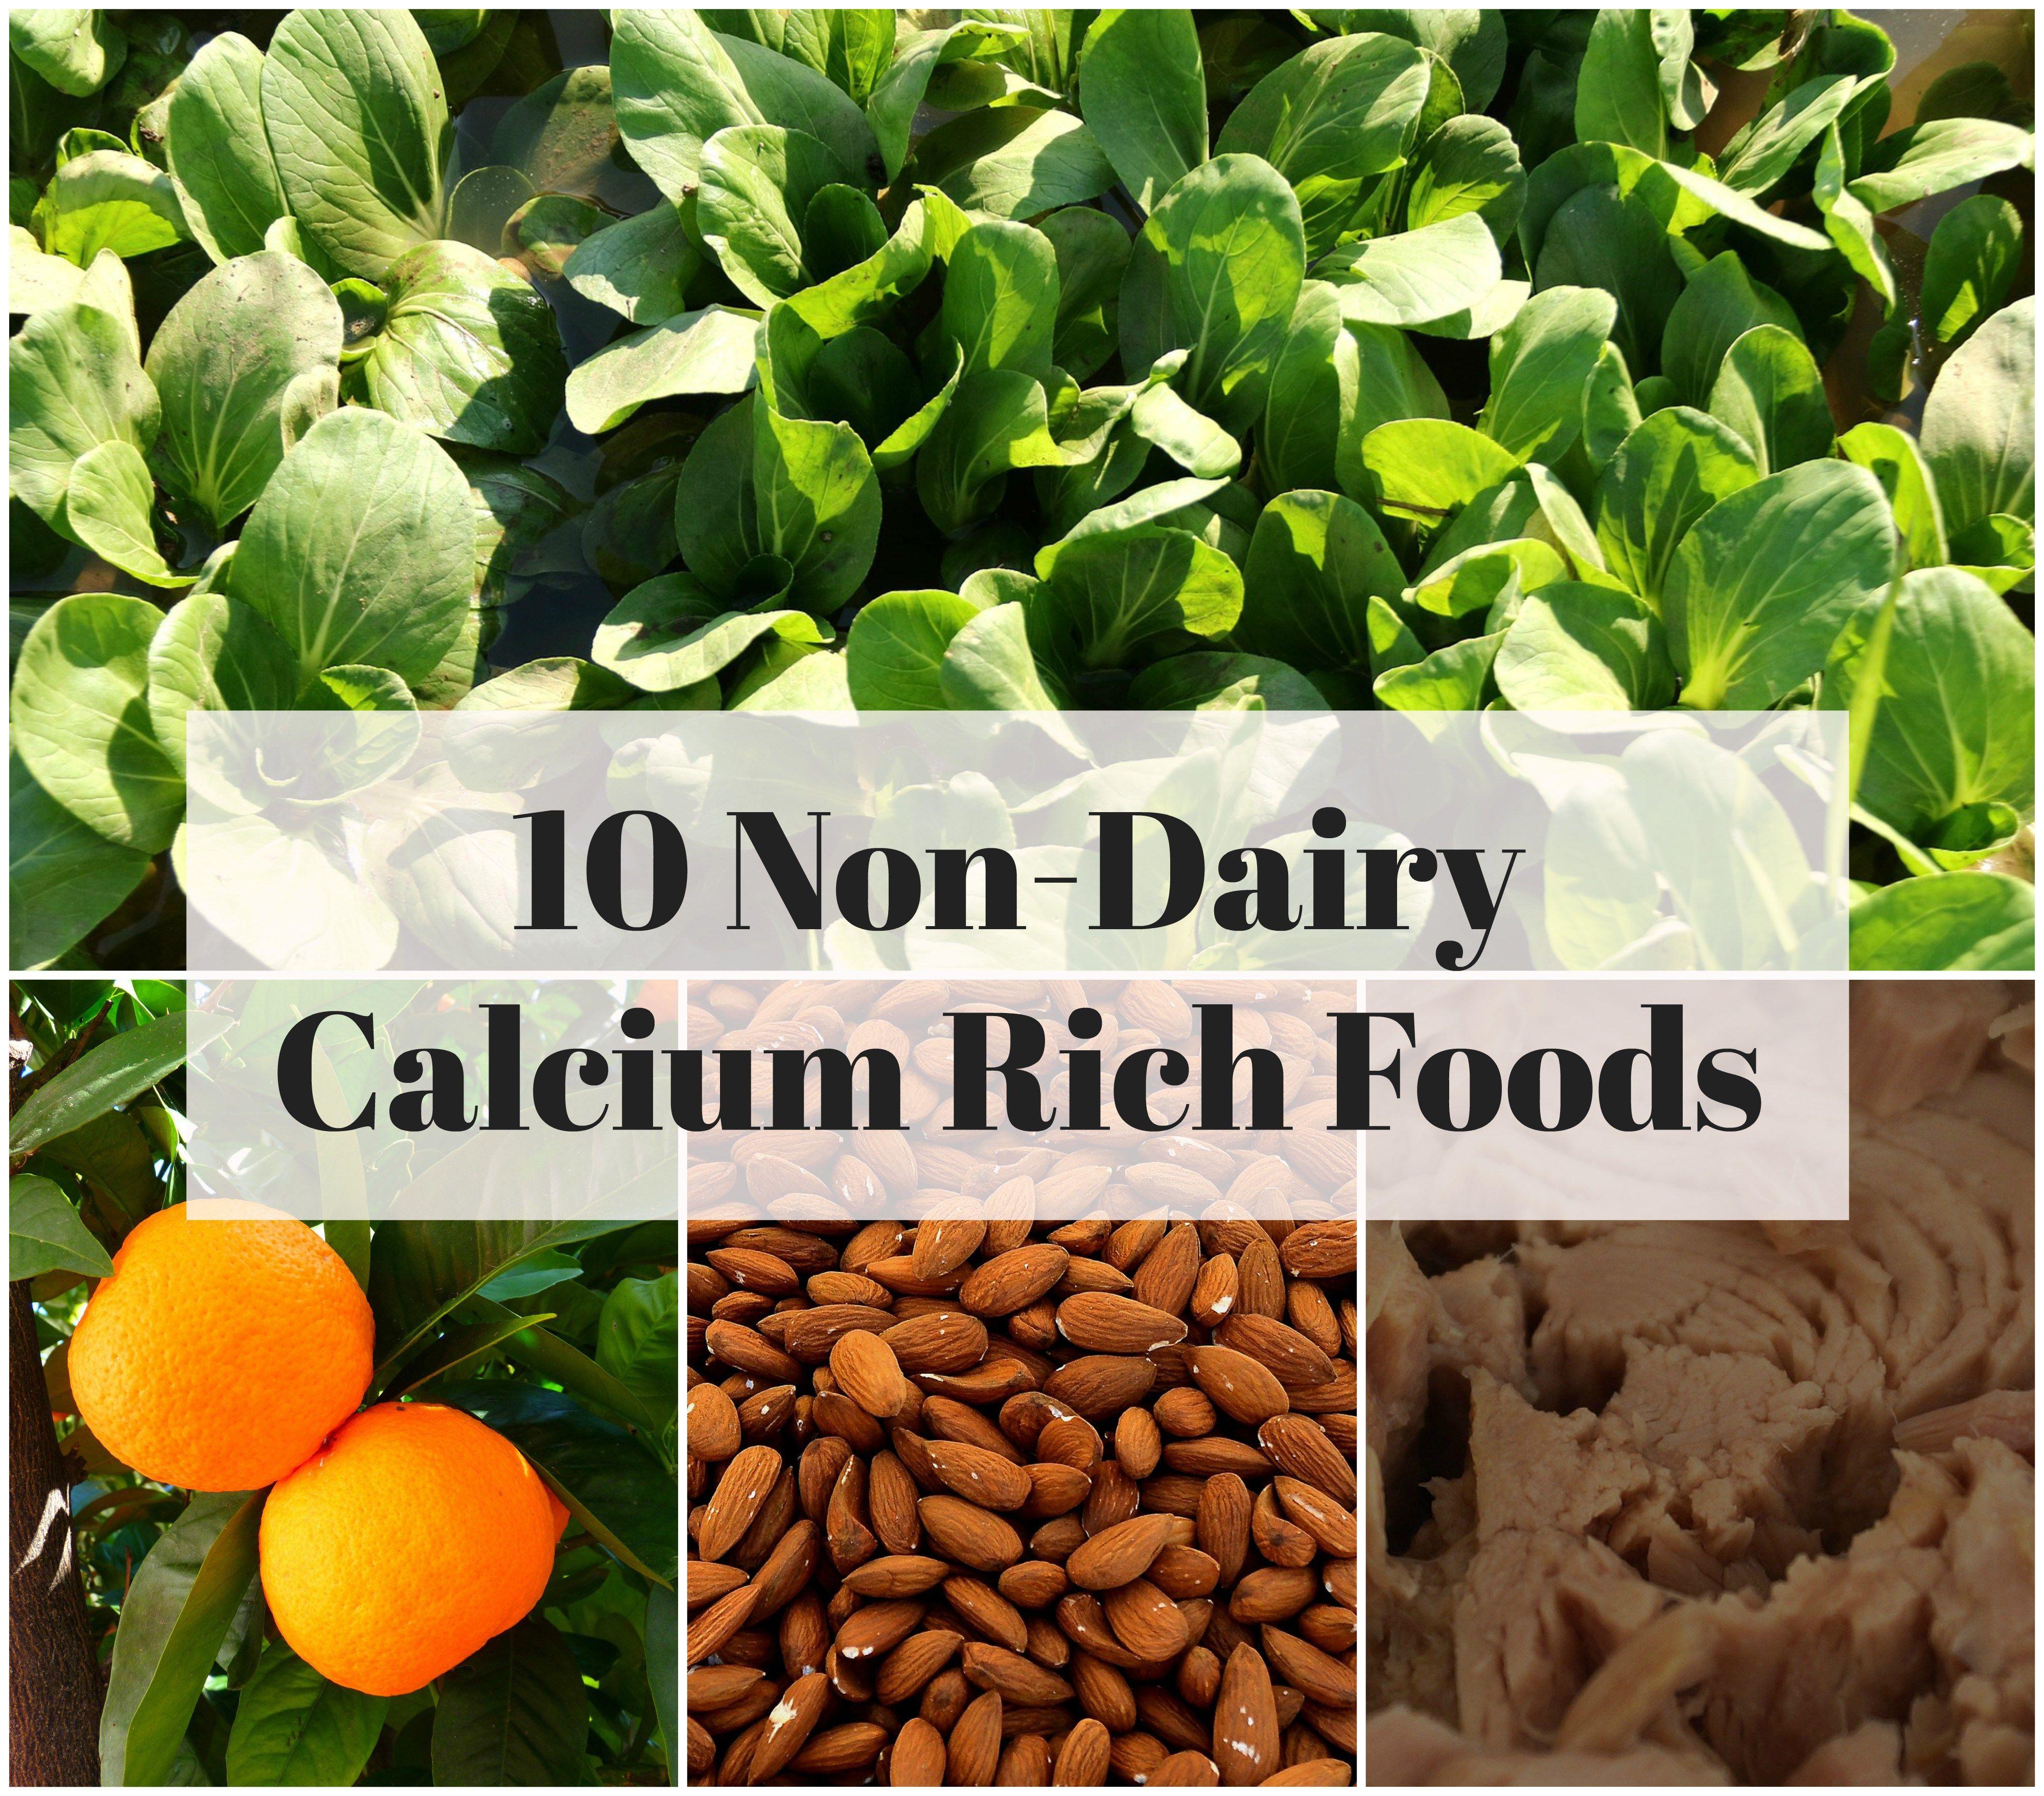 10 non dairy calcium rich foods xperimentsinliving top 10 non dairy calcium rich foods xperimentsinliving forumfinder Images